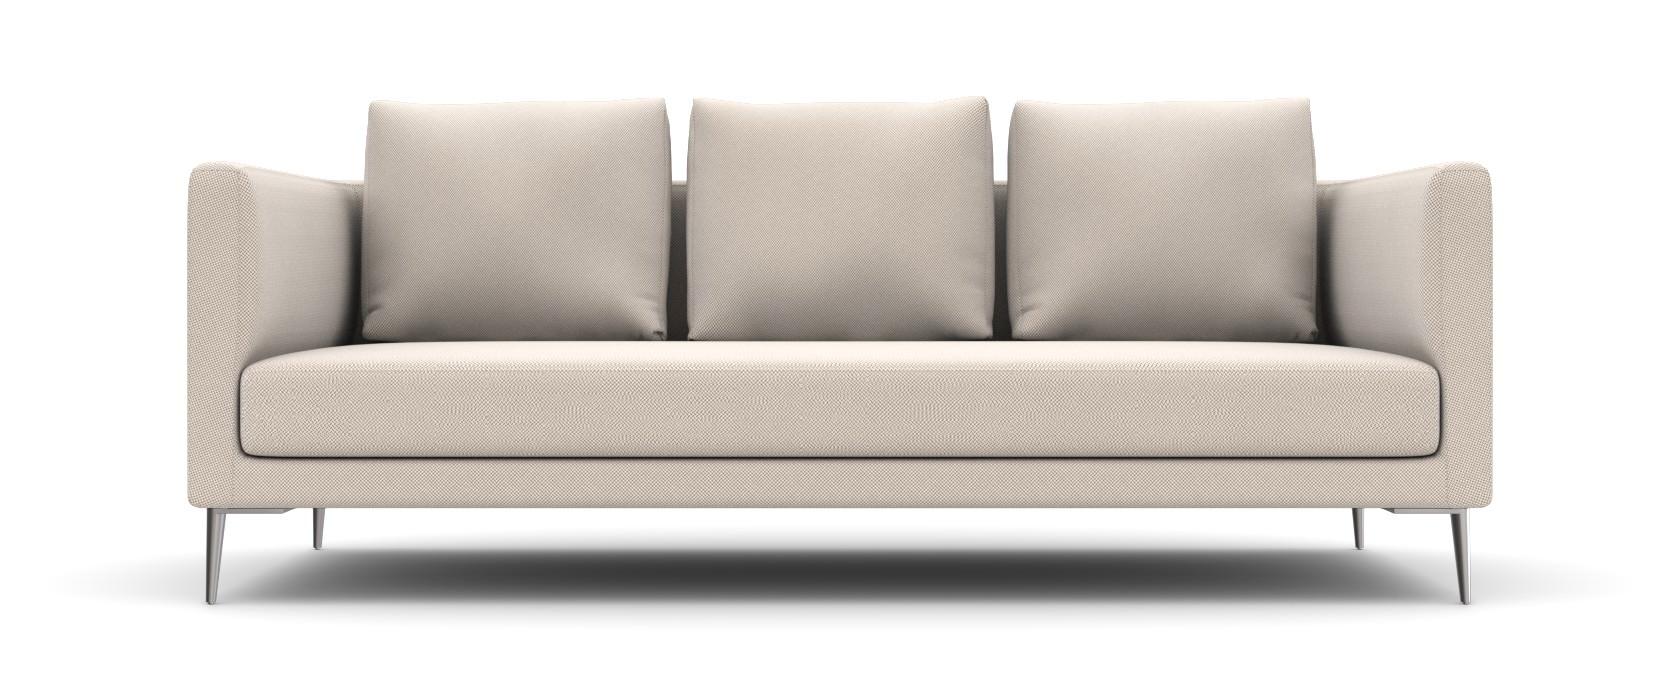 Трехместный диван Augusto